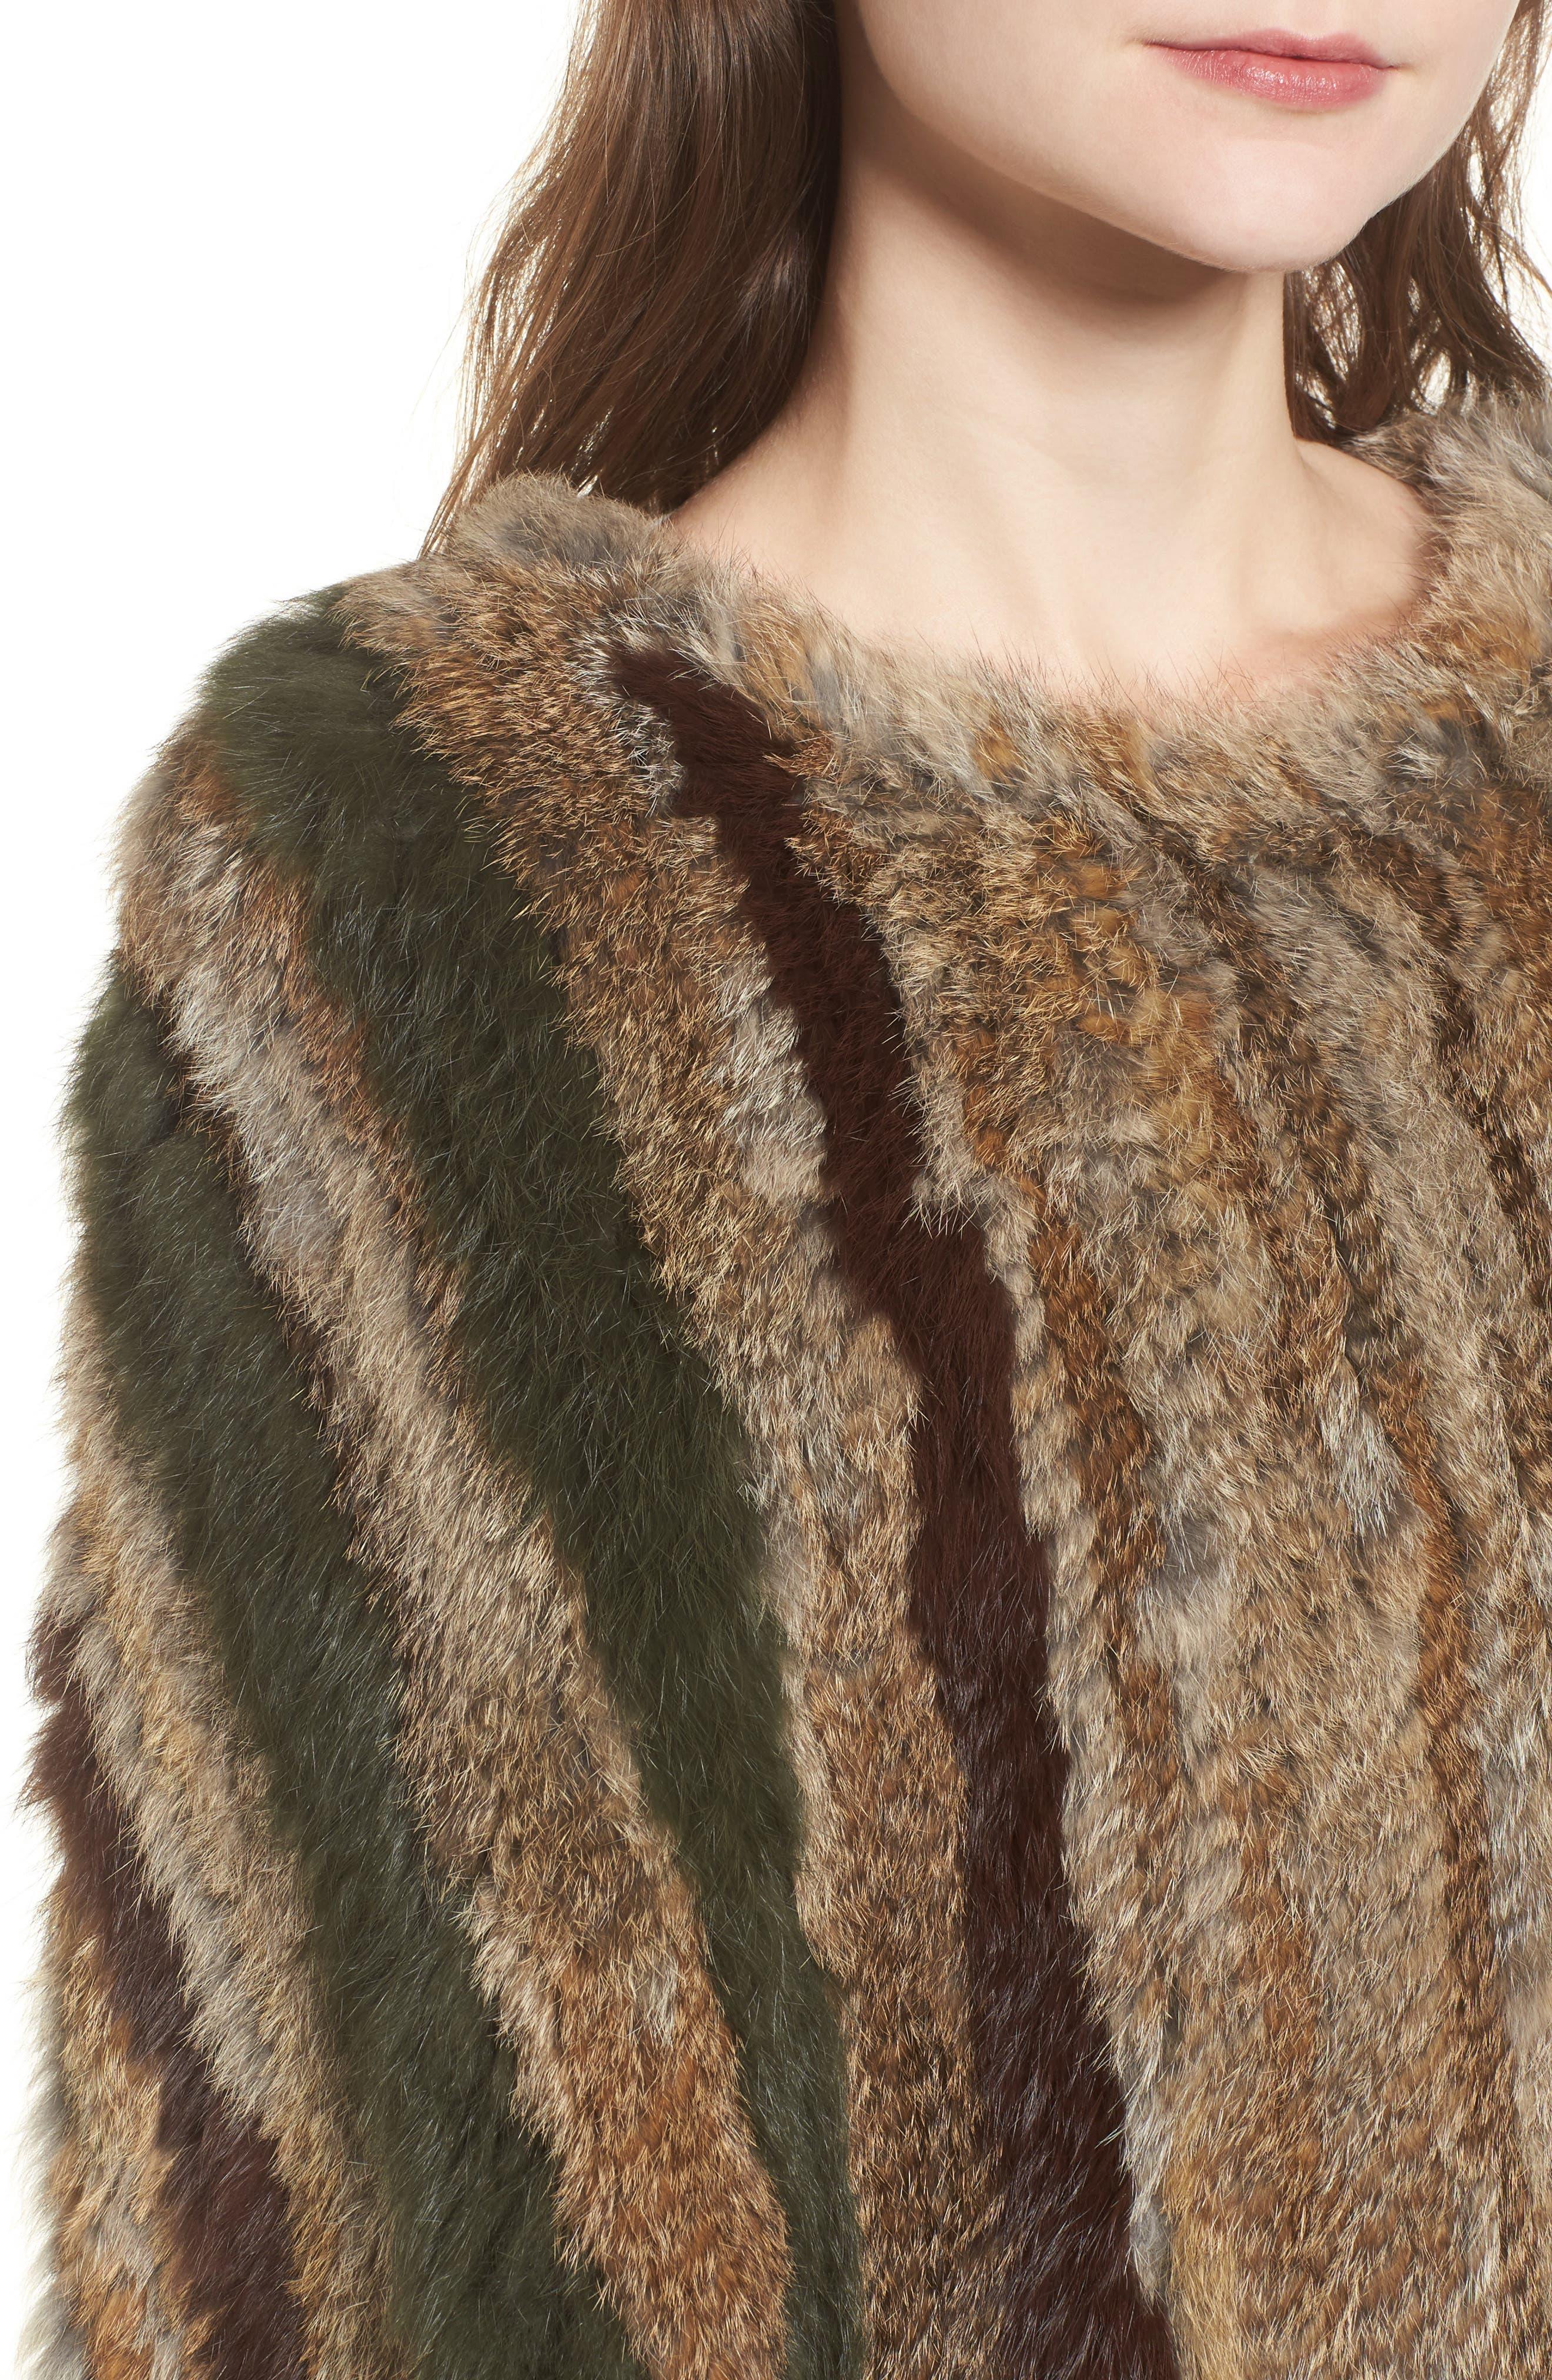 BNCI Nomad Genuine Rabbit Fur Pullover,                             Alternate thumbnail 4, color,                             208